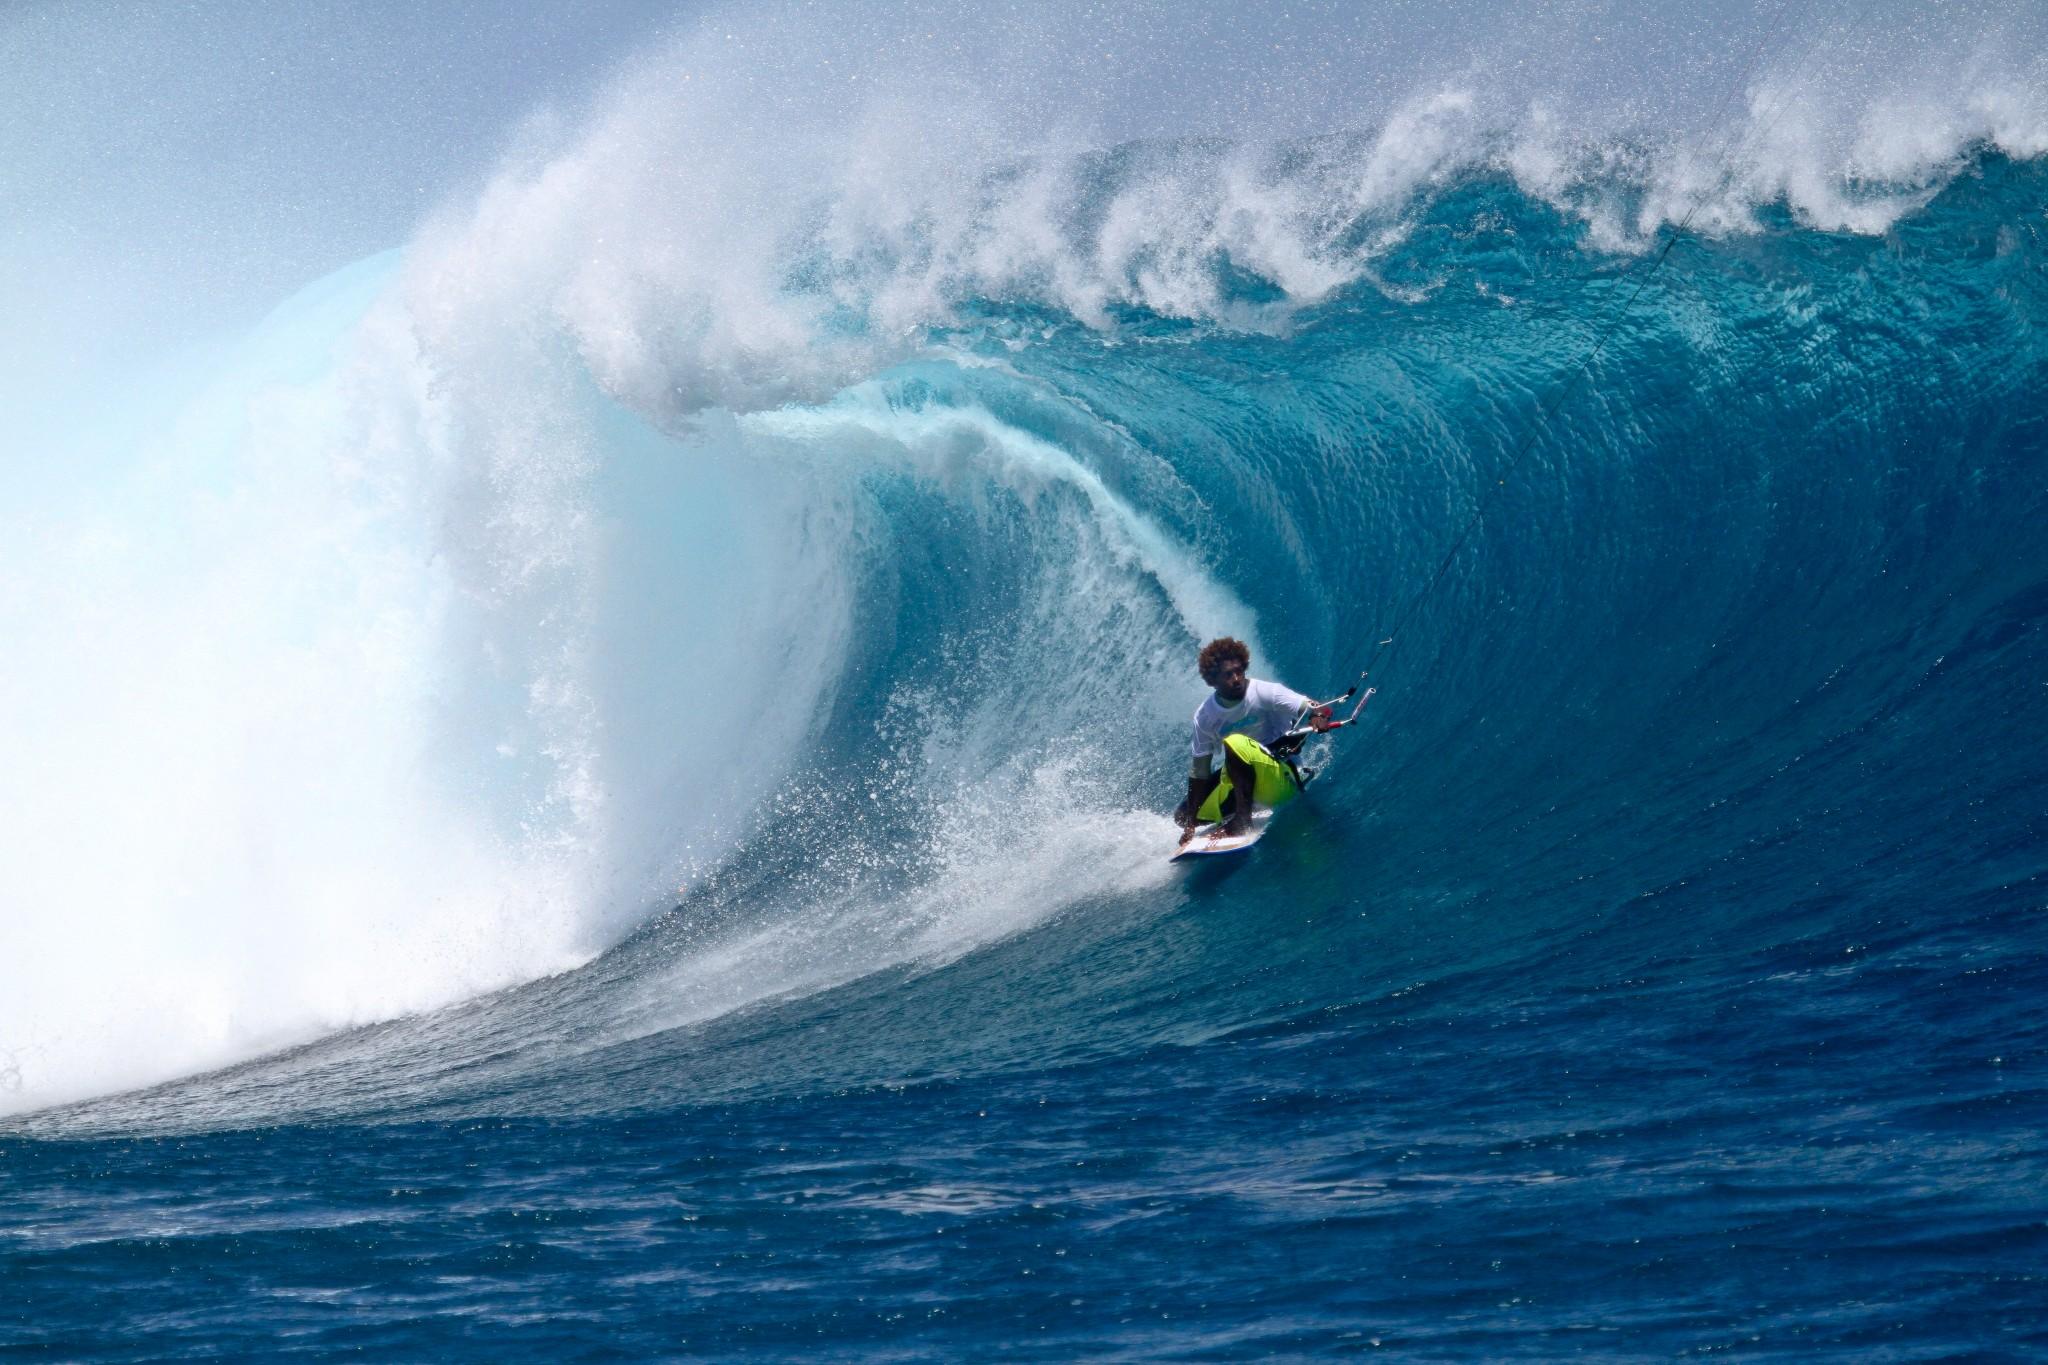 Le Morne Kitesurfing Holidays And Travel Guides 187 Africa 187 Mauritius Free Kitesurfing